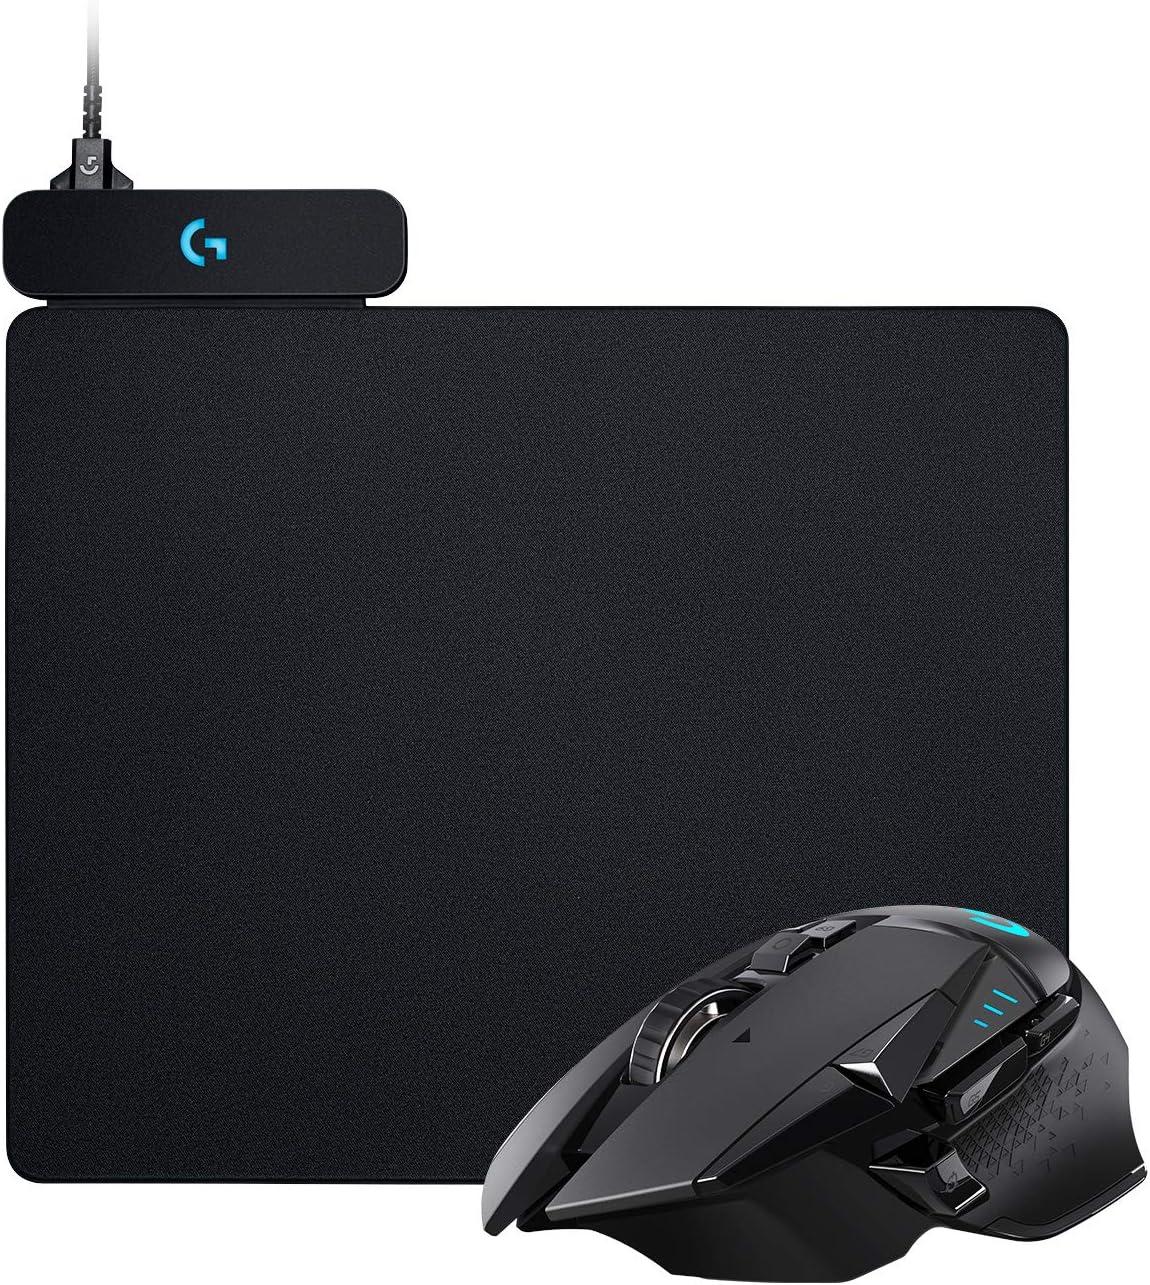 Logitech G502 Lightspeed - Ratón Inalámbrico para Gaming, Negro + POWERPLAY Sistema de Carga inalámbrico